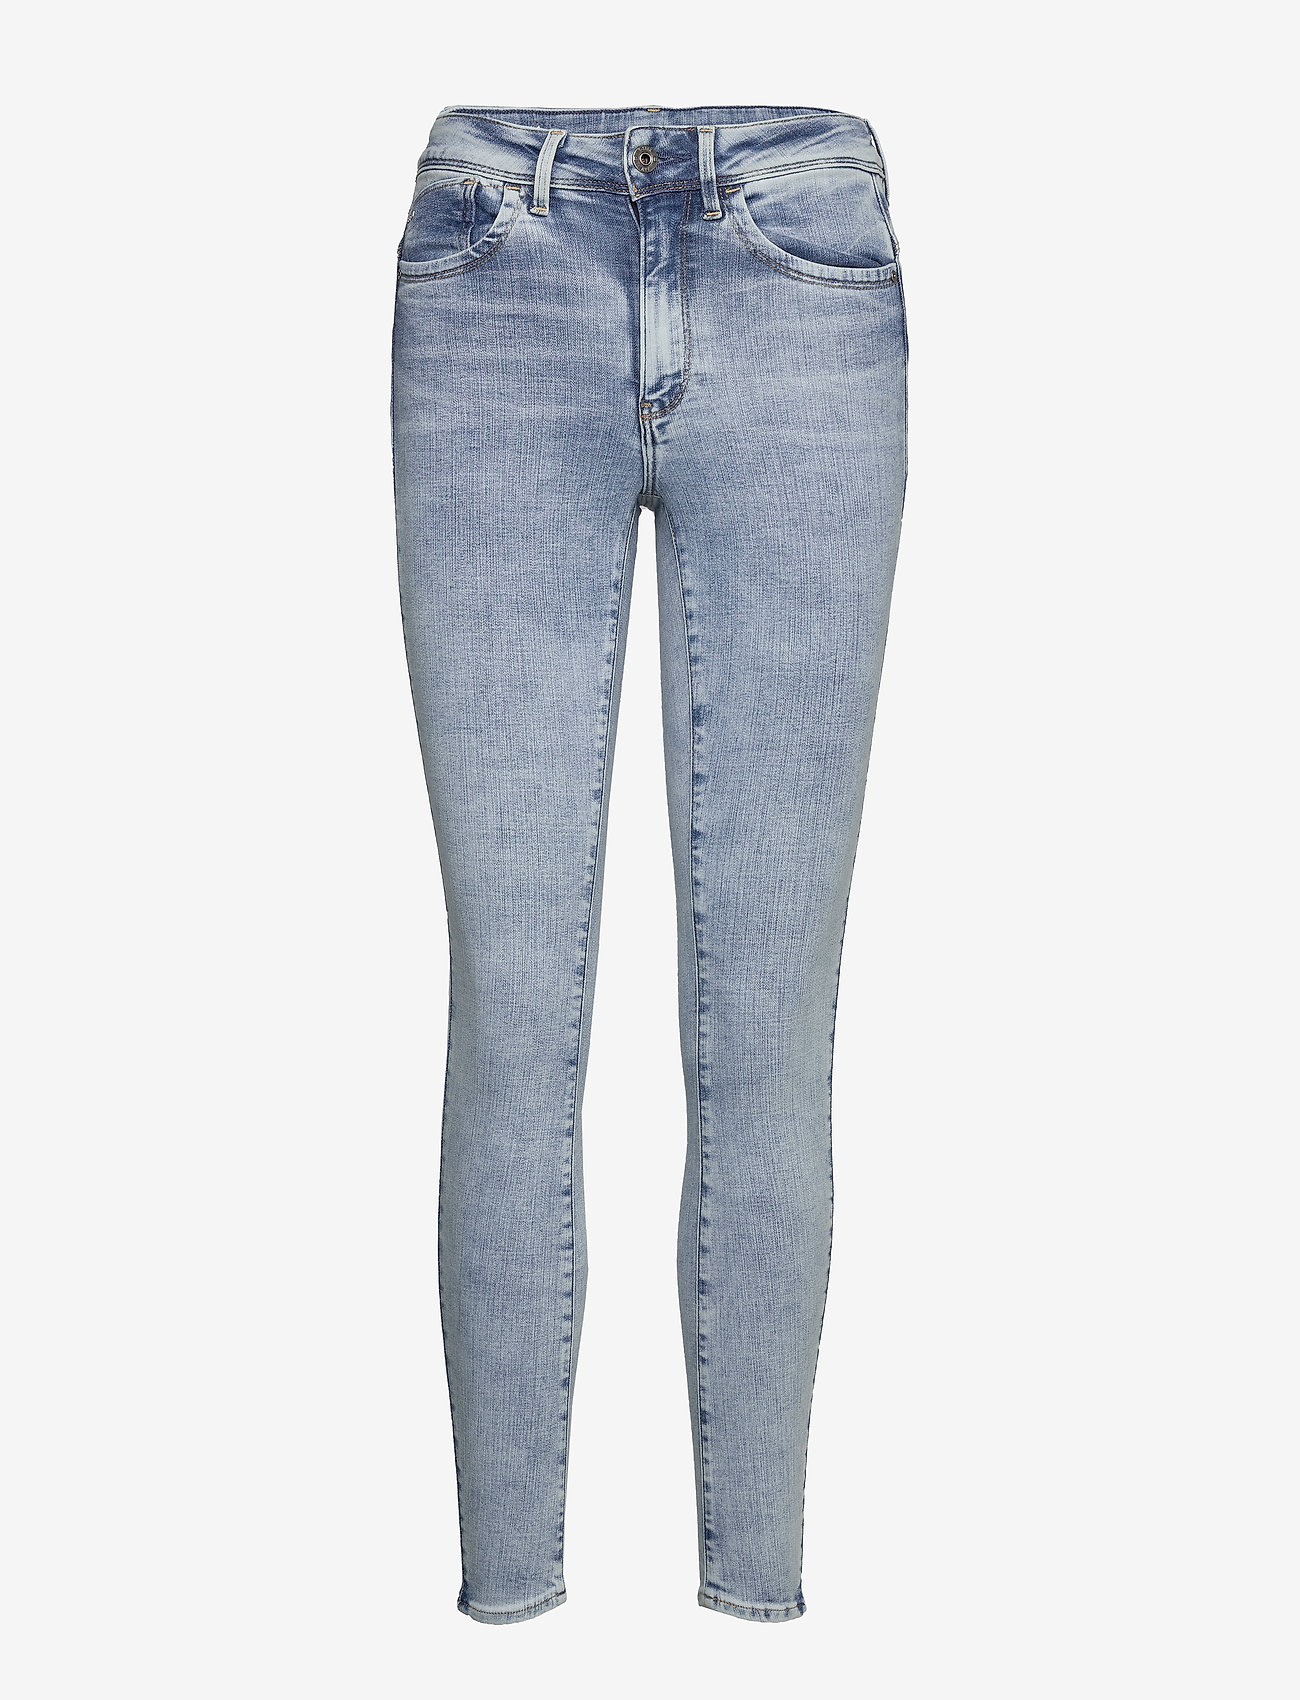 G-star RAW - Lhana High Super Skinny Wmn - skinny jeans - sun faded iceberg - 1